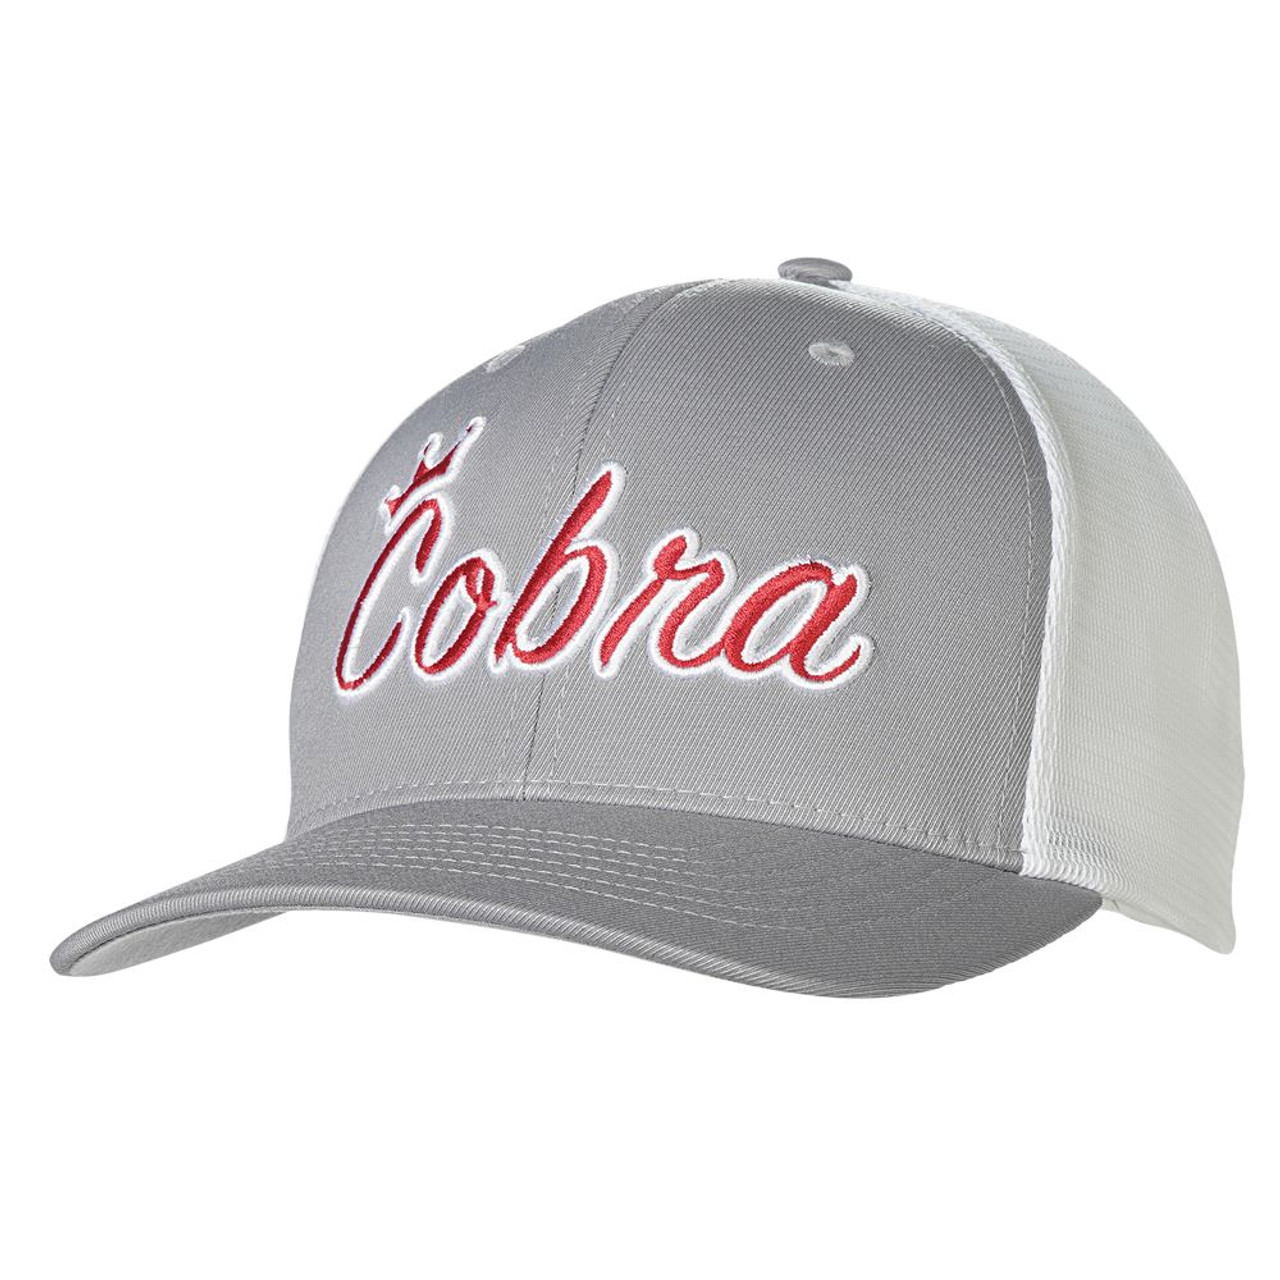 Cobra Crown C Trucker Snapback Cap - High Rise